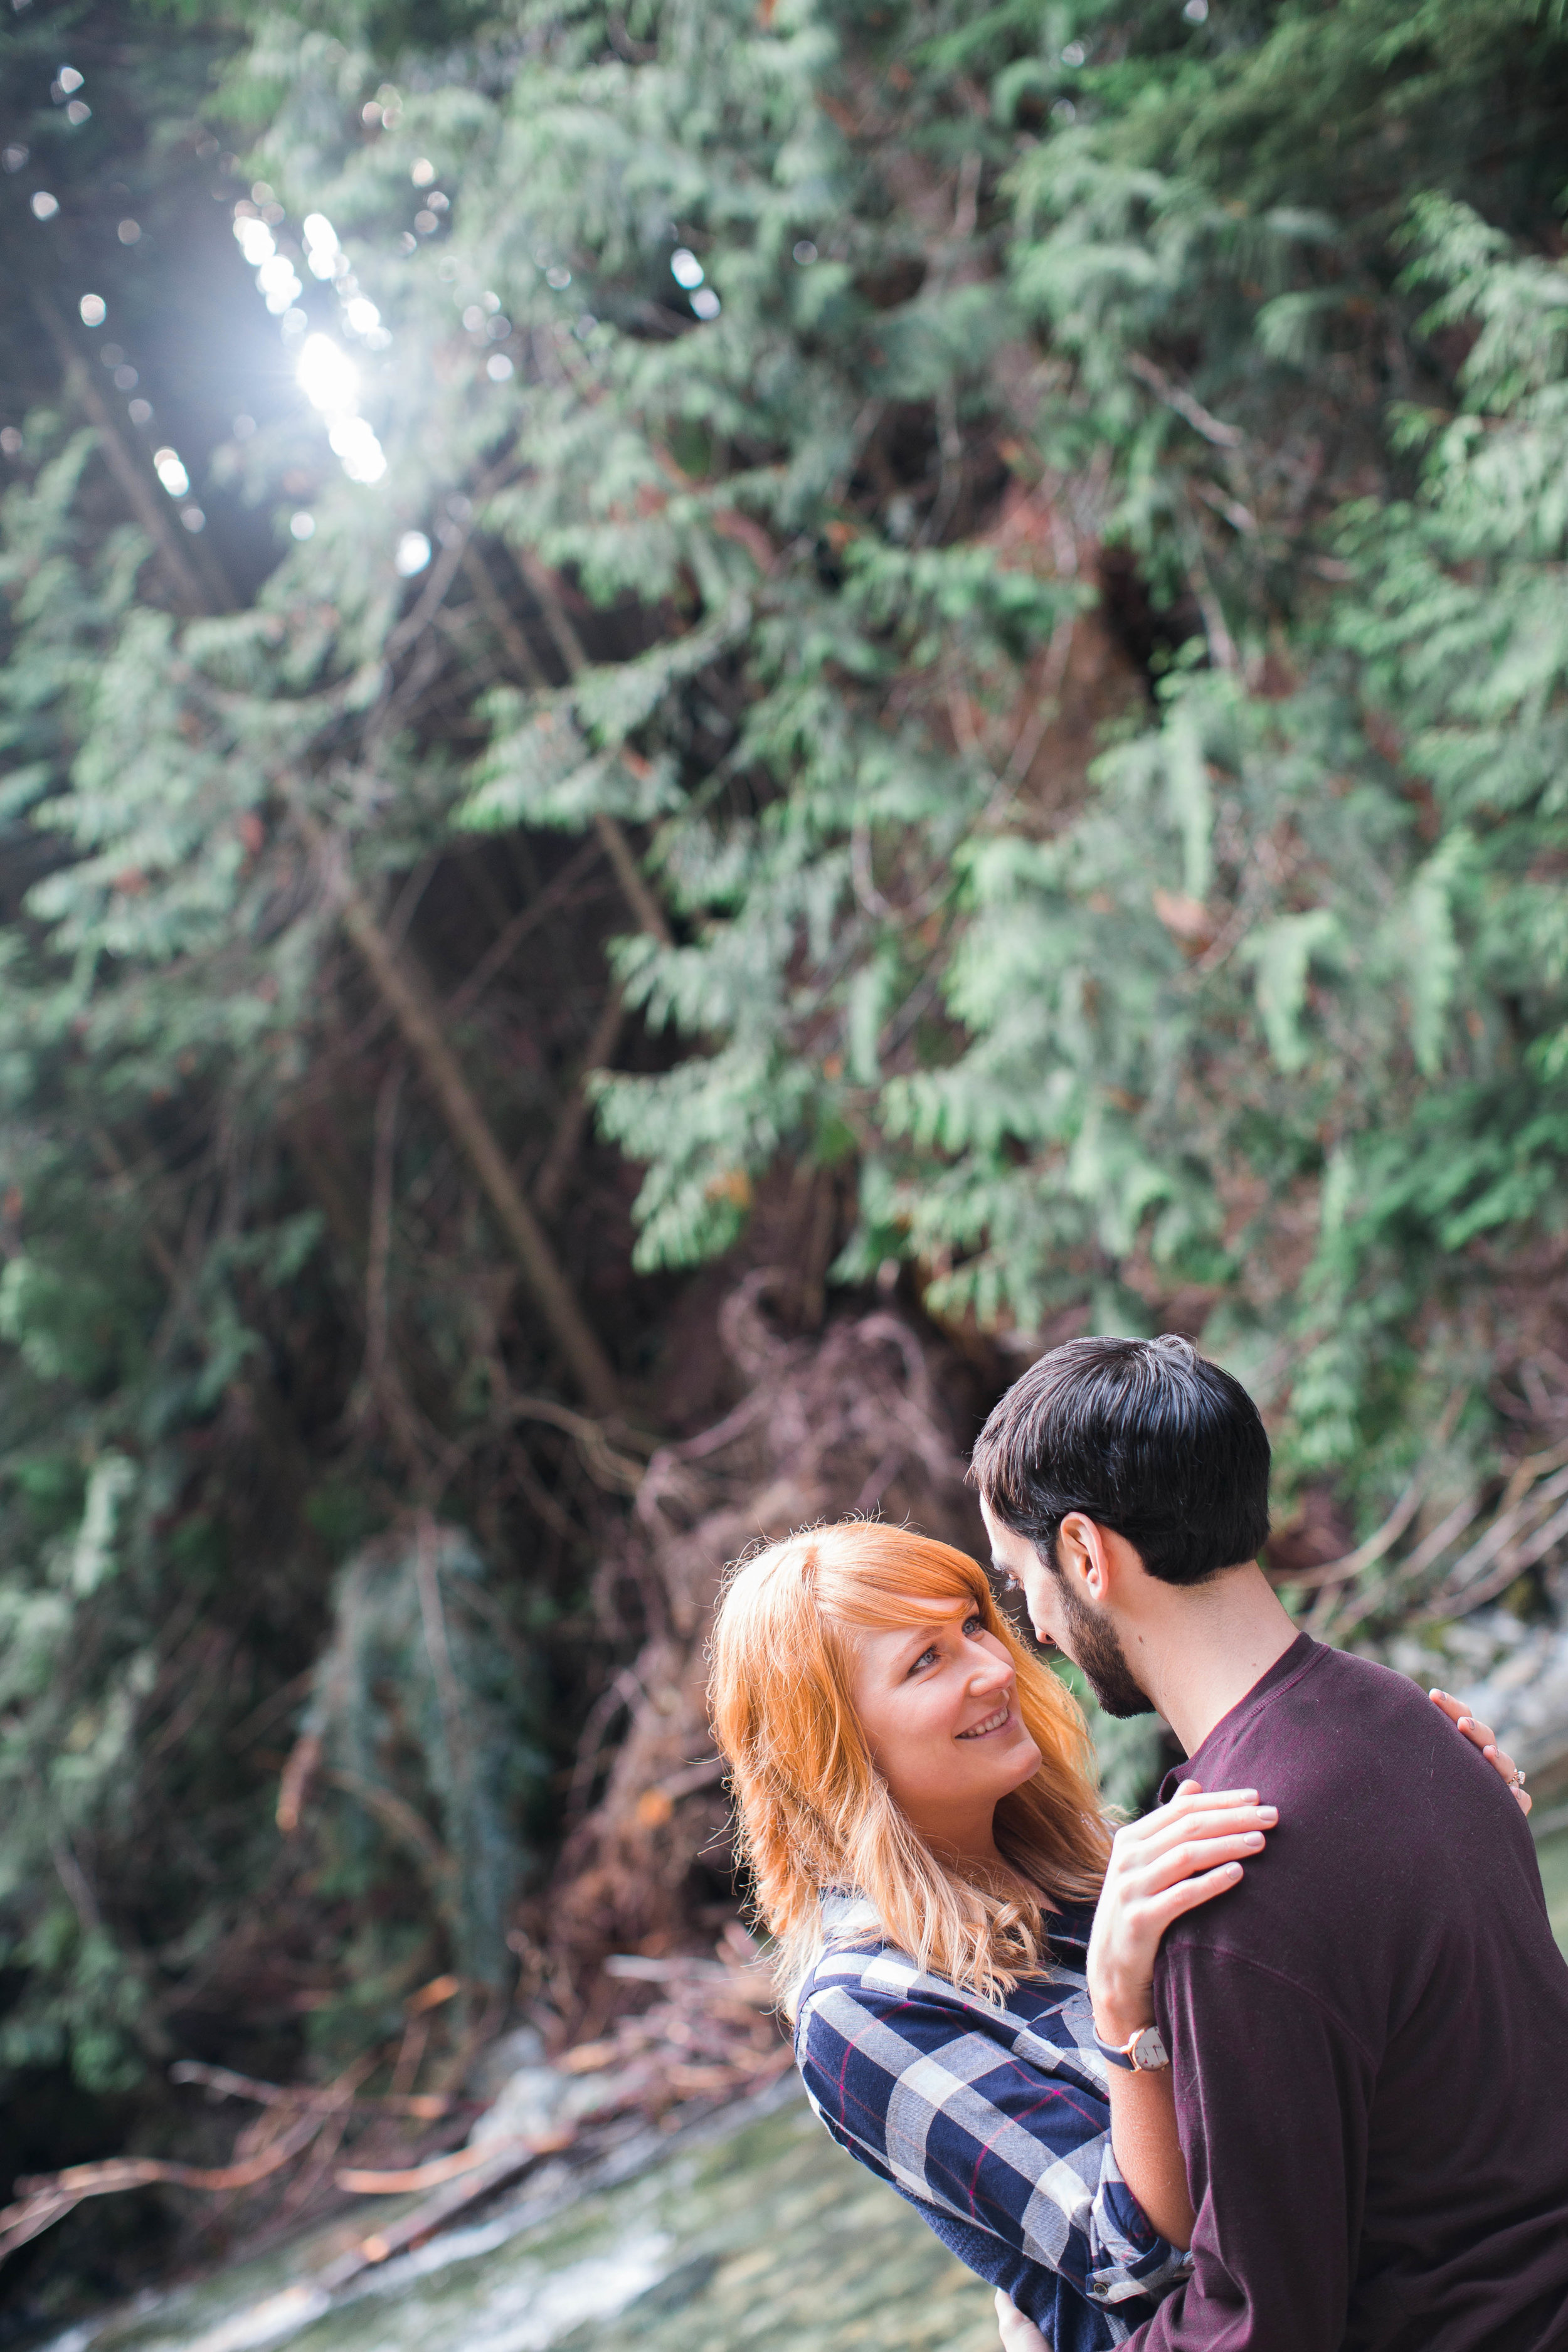 Ryan+Nicole_Franklin+Falls+Engagement_APW2016_18.JPG